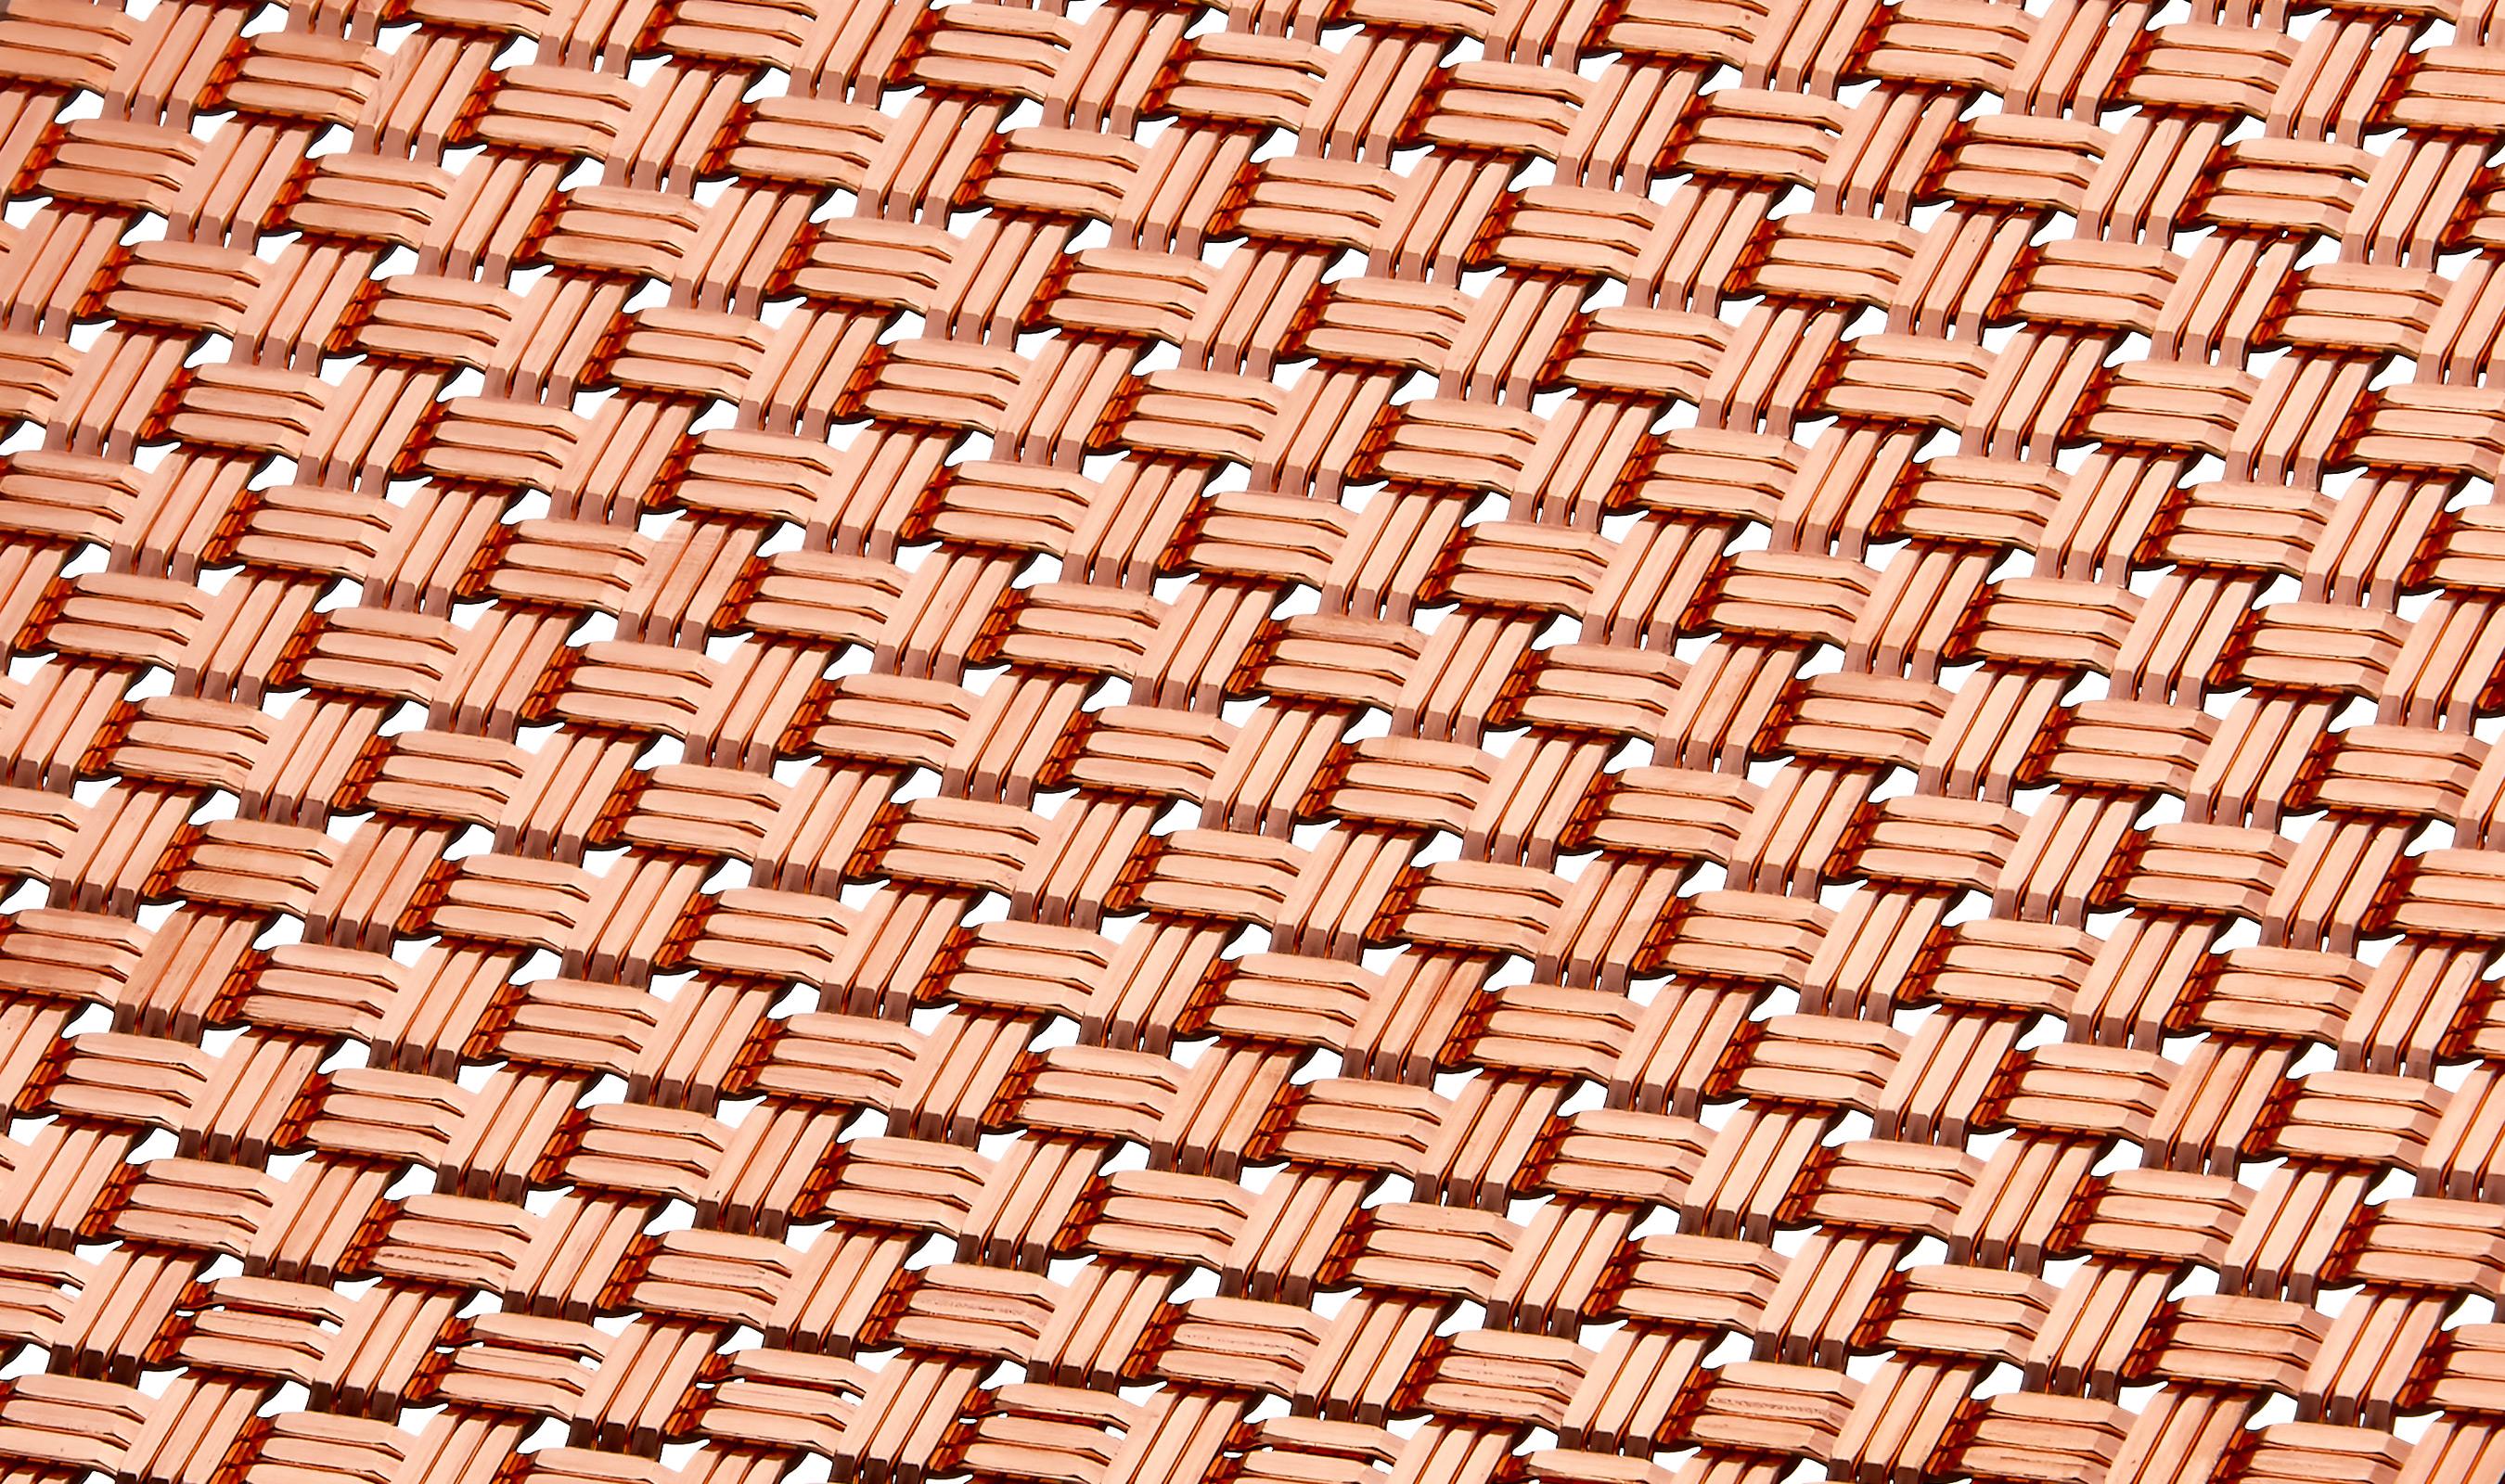 M33-2 Copper